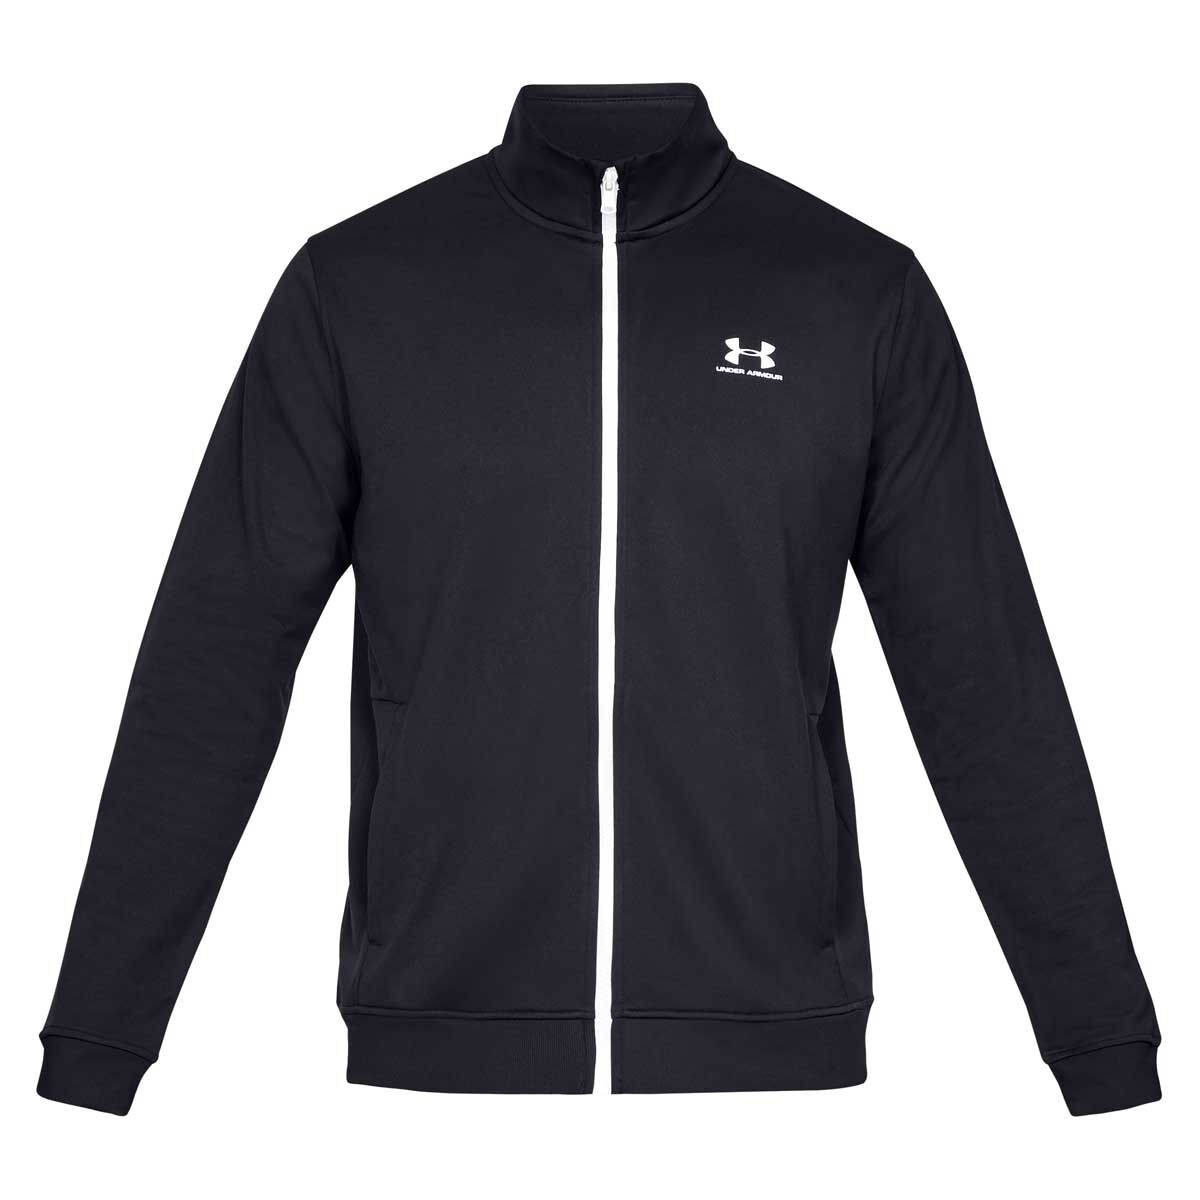 Reebok Boys Ultimate Tricot Tech Fleece Zip Up Jacket